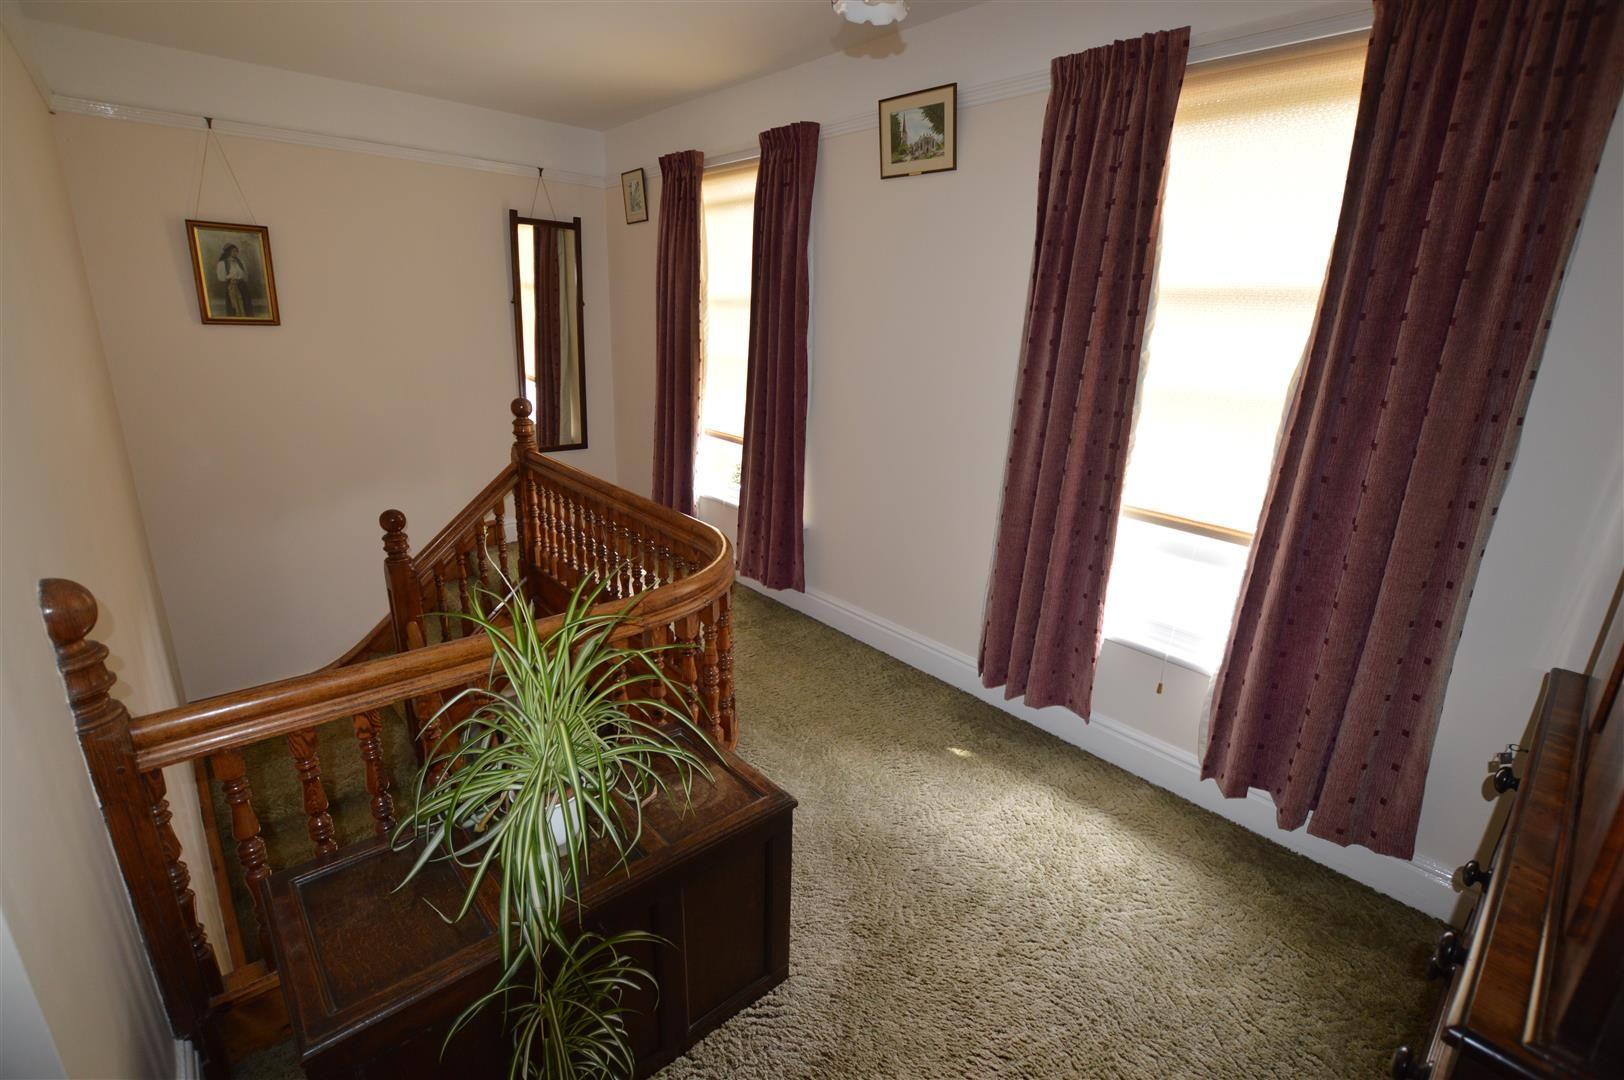 6 bed detached for sale in Leominster 5